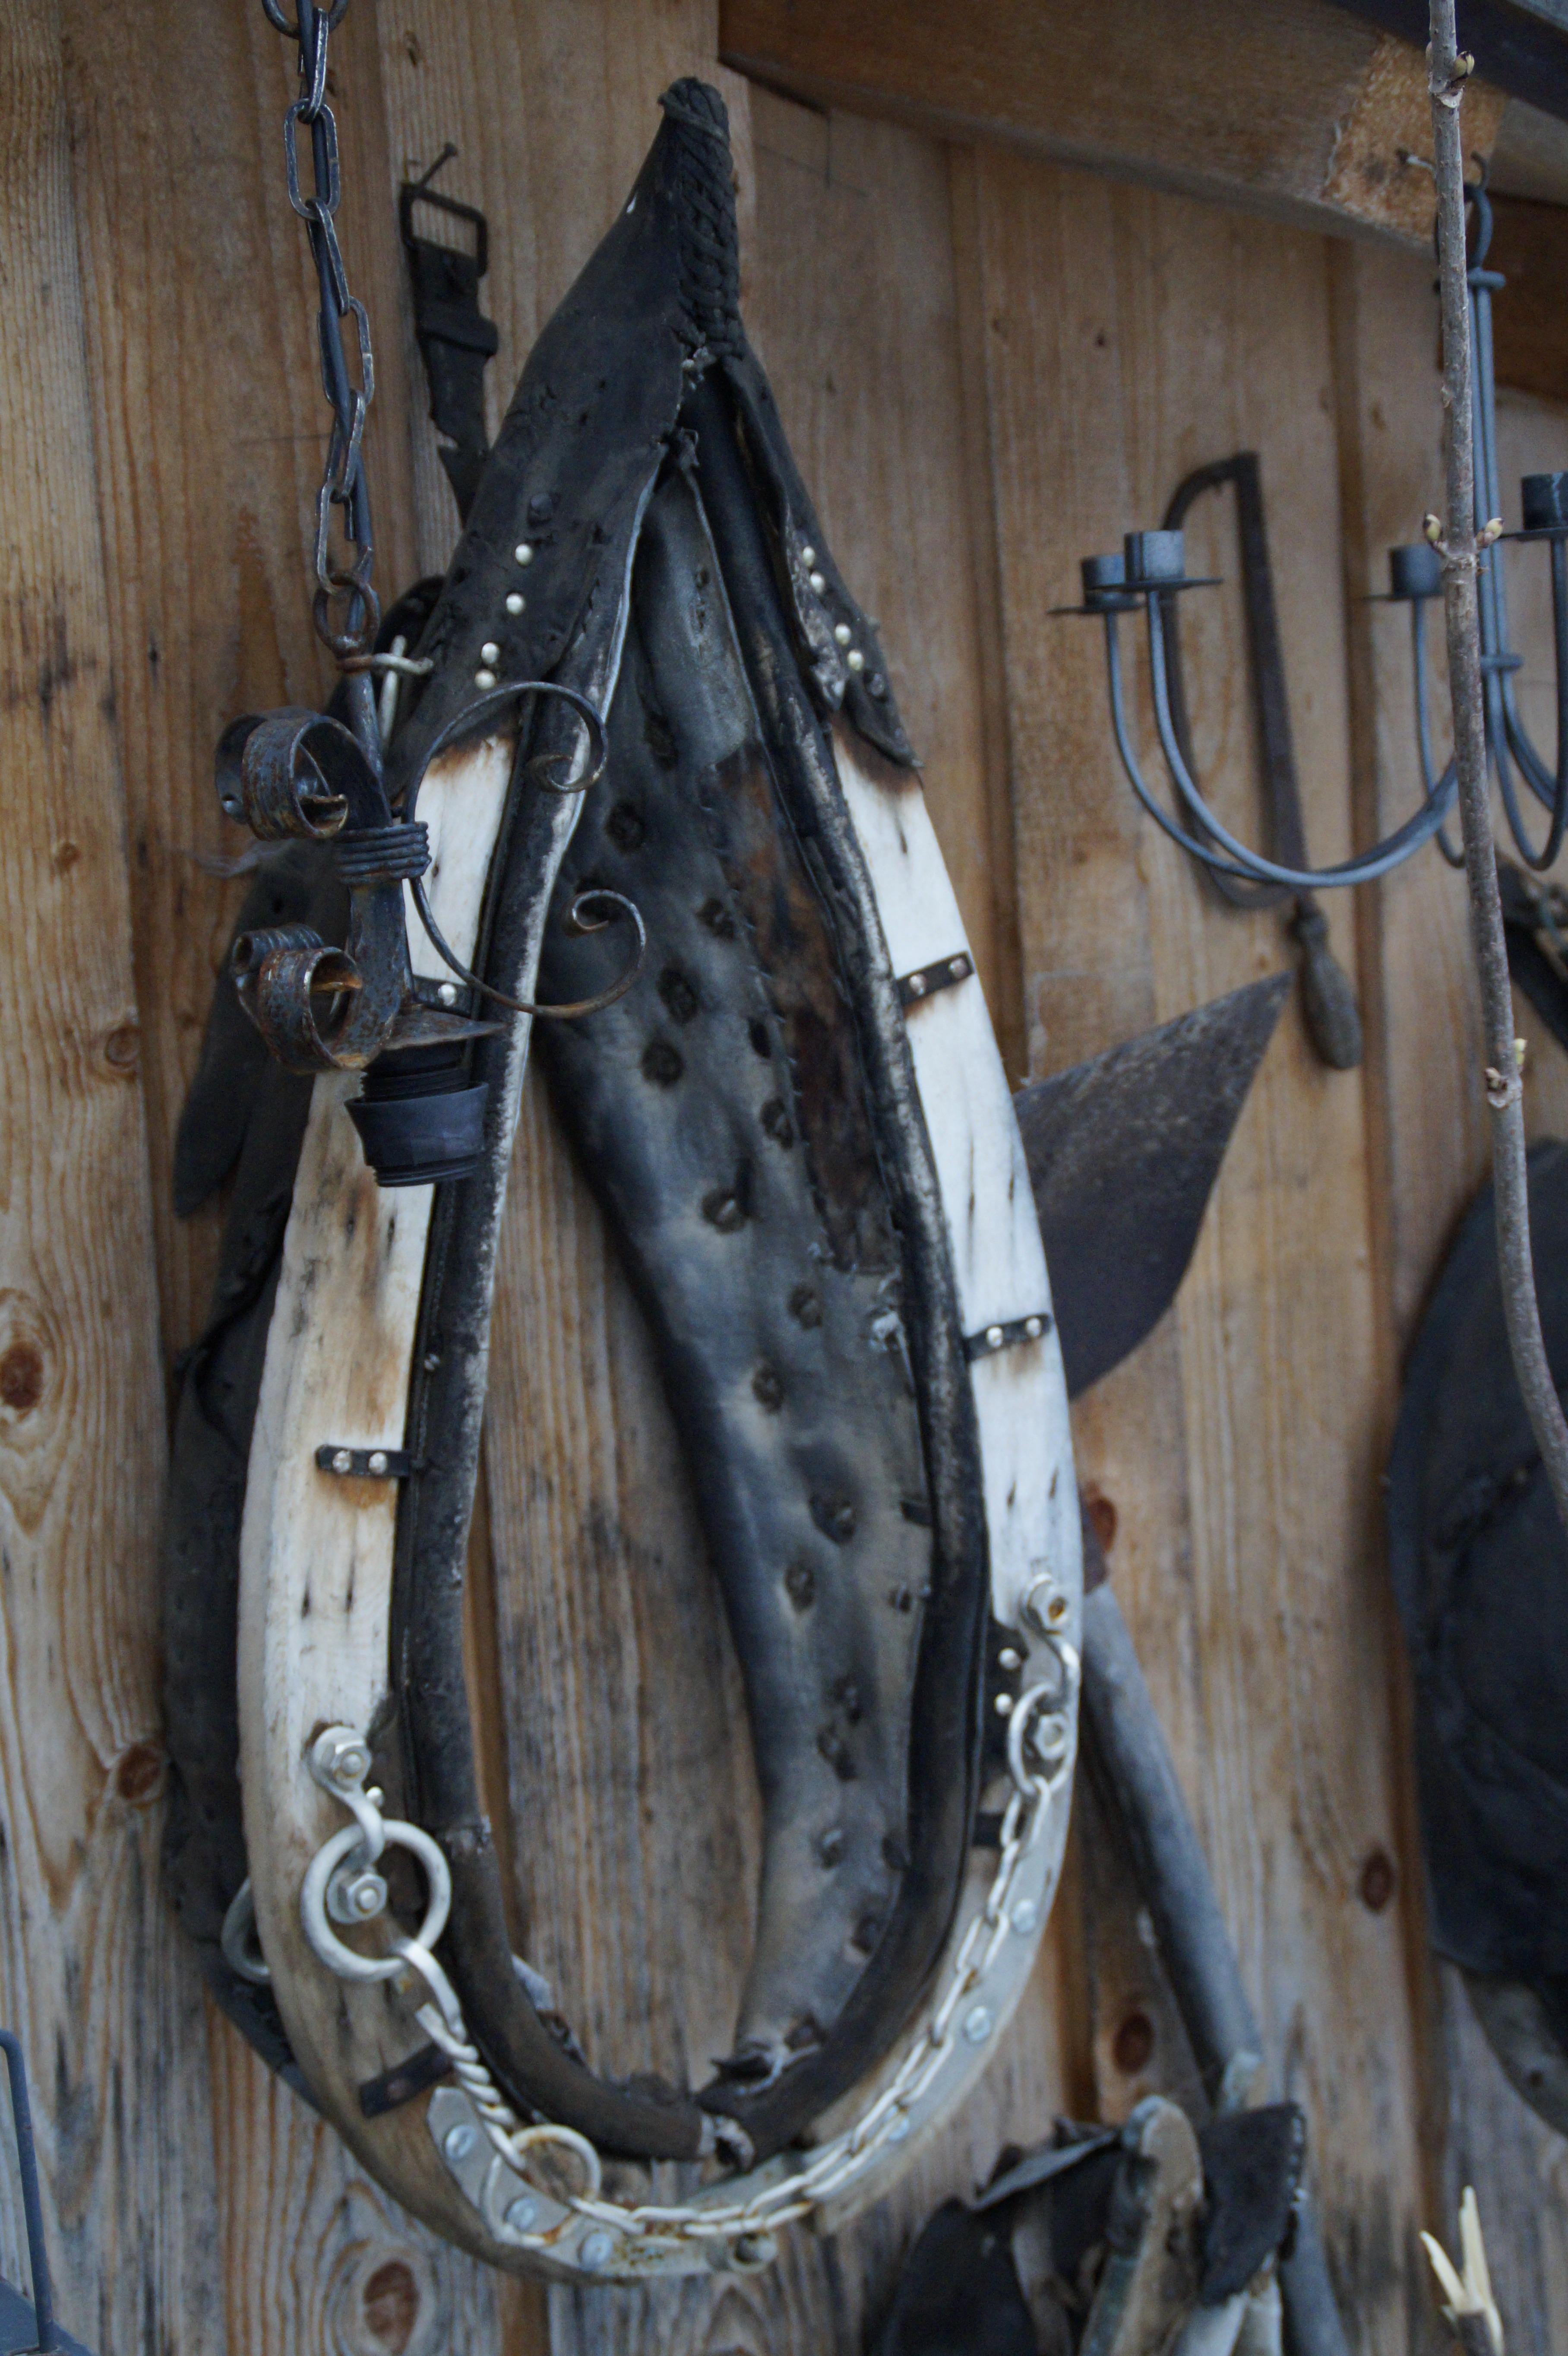 Kostenlose foto : Holz, Leder, Fahrrad, Fahrzeug, Vieh, Zügel ...